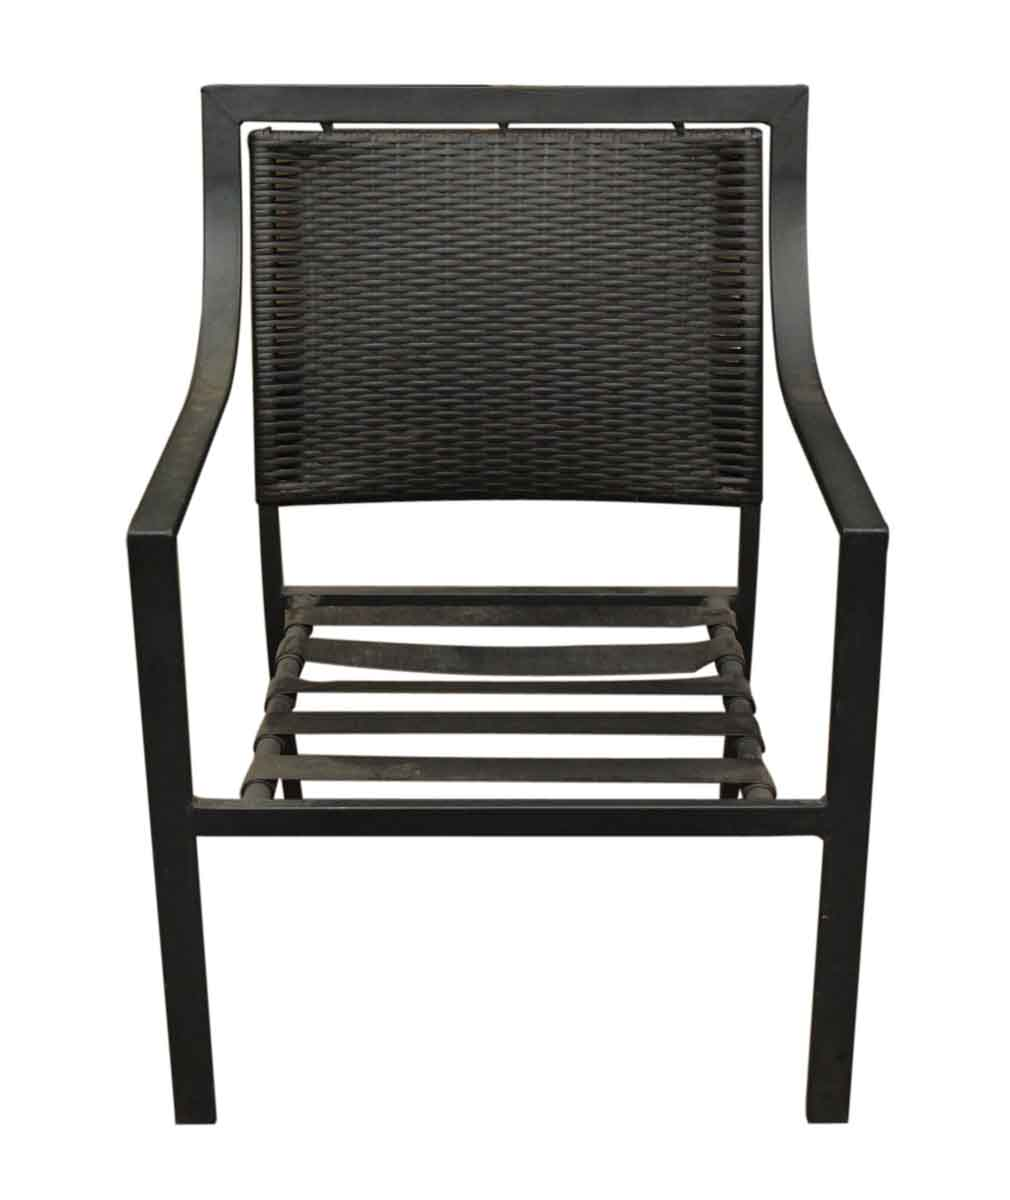 Strange Low Slung Outdoor Metal Chair Andrewgaddart Wooden Chair Designs For Living Room Andrewgaddartcom